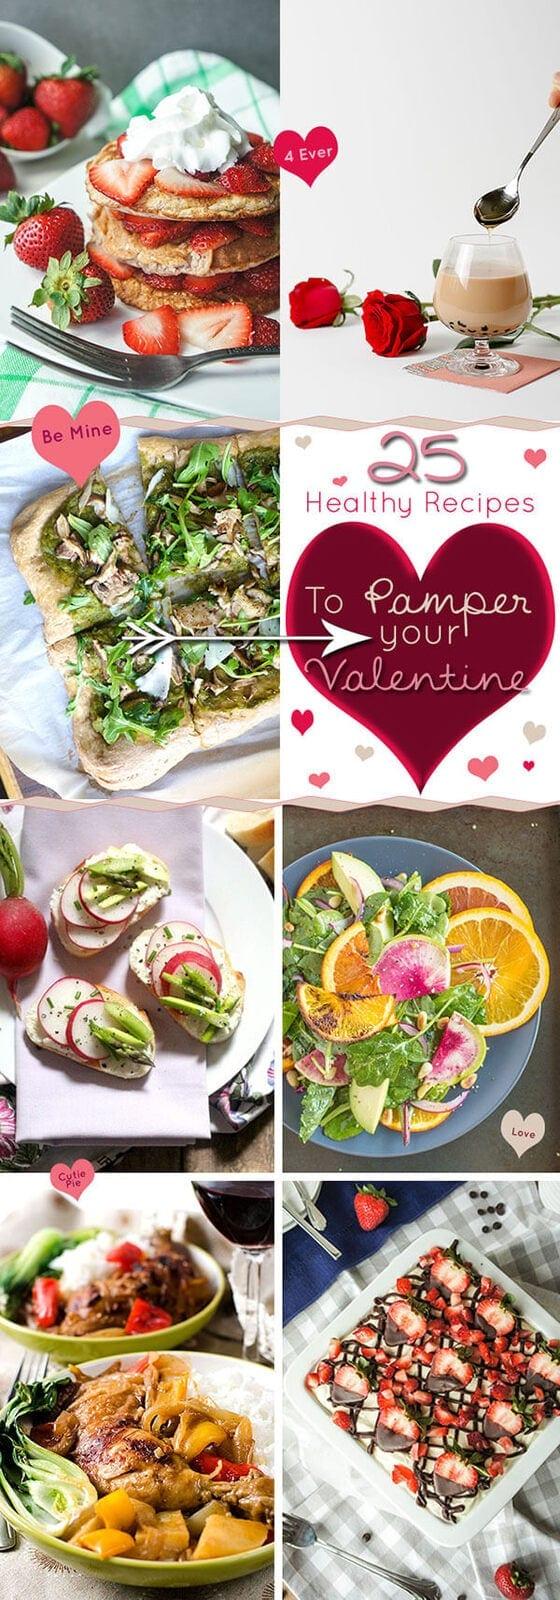 25 Healthy Recipes to Pamper Your Valentine - Cover | omnivorescookbook.com